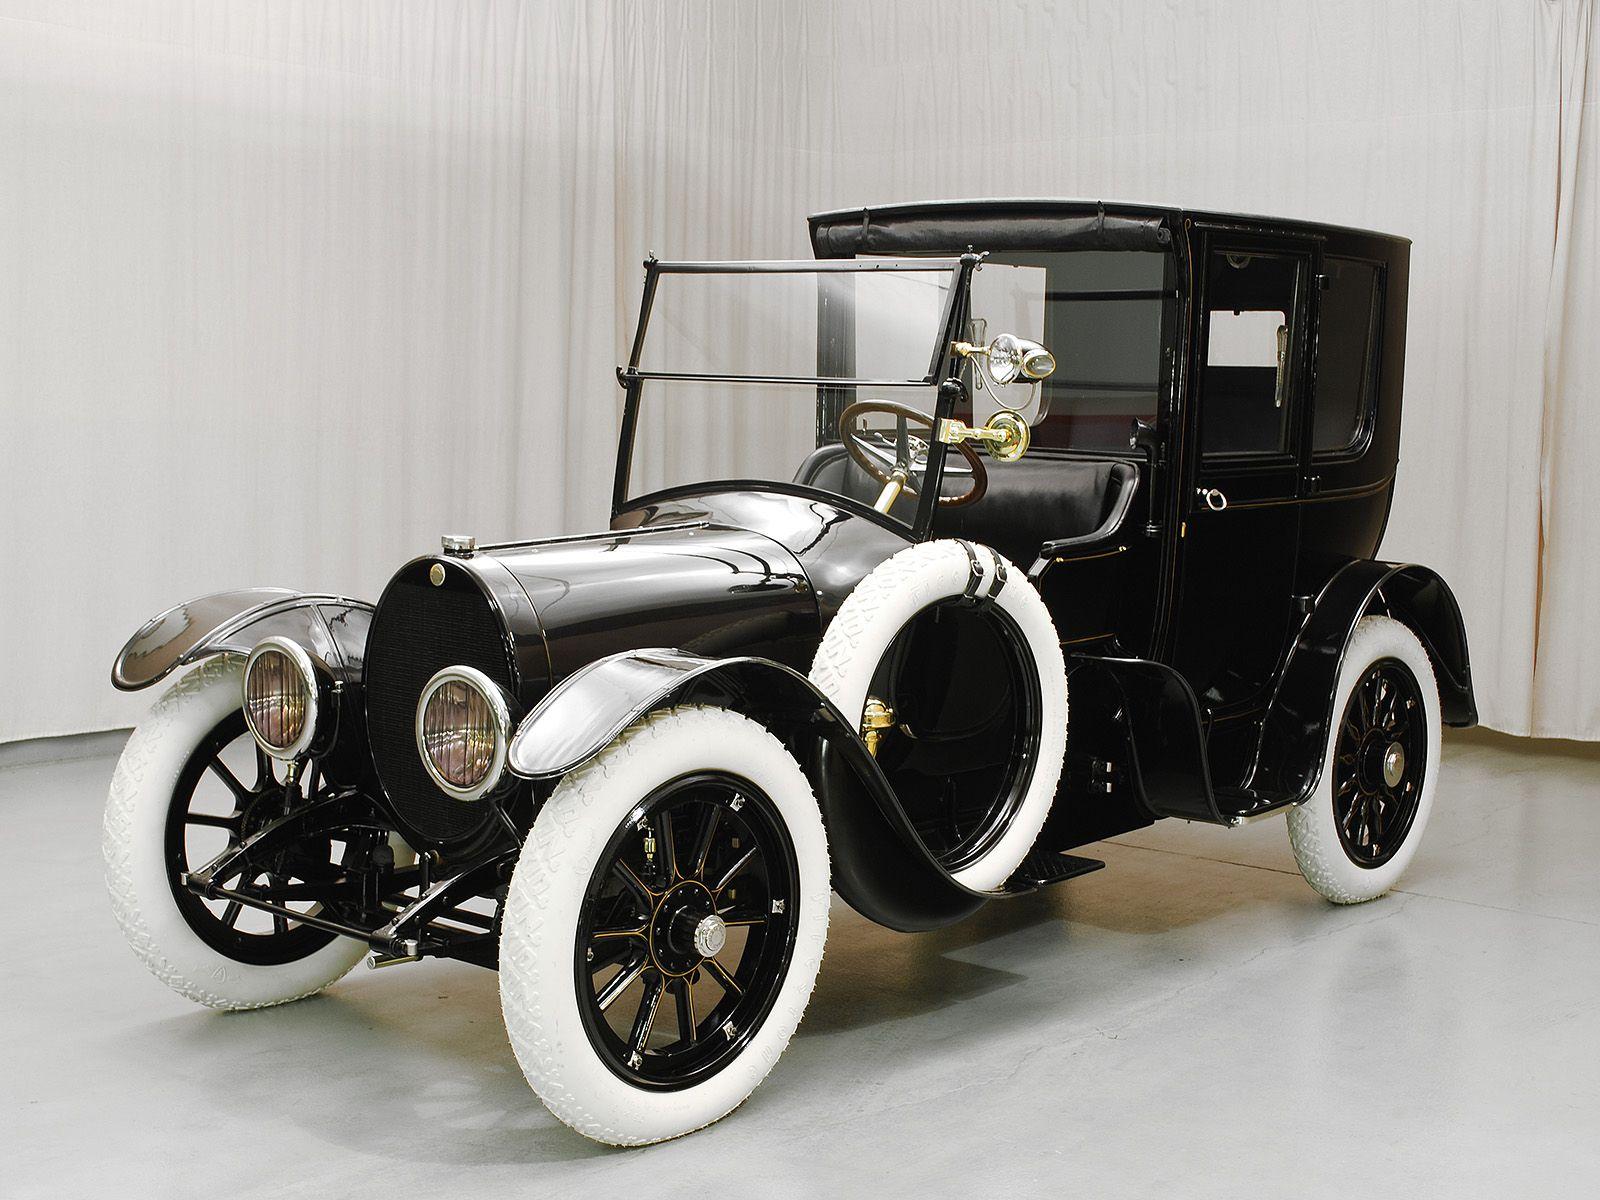 1915 Brewster Town Car - Hyman Ltd. Classic Cars | Vintage Cars ...